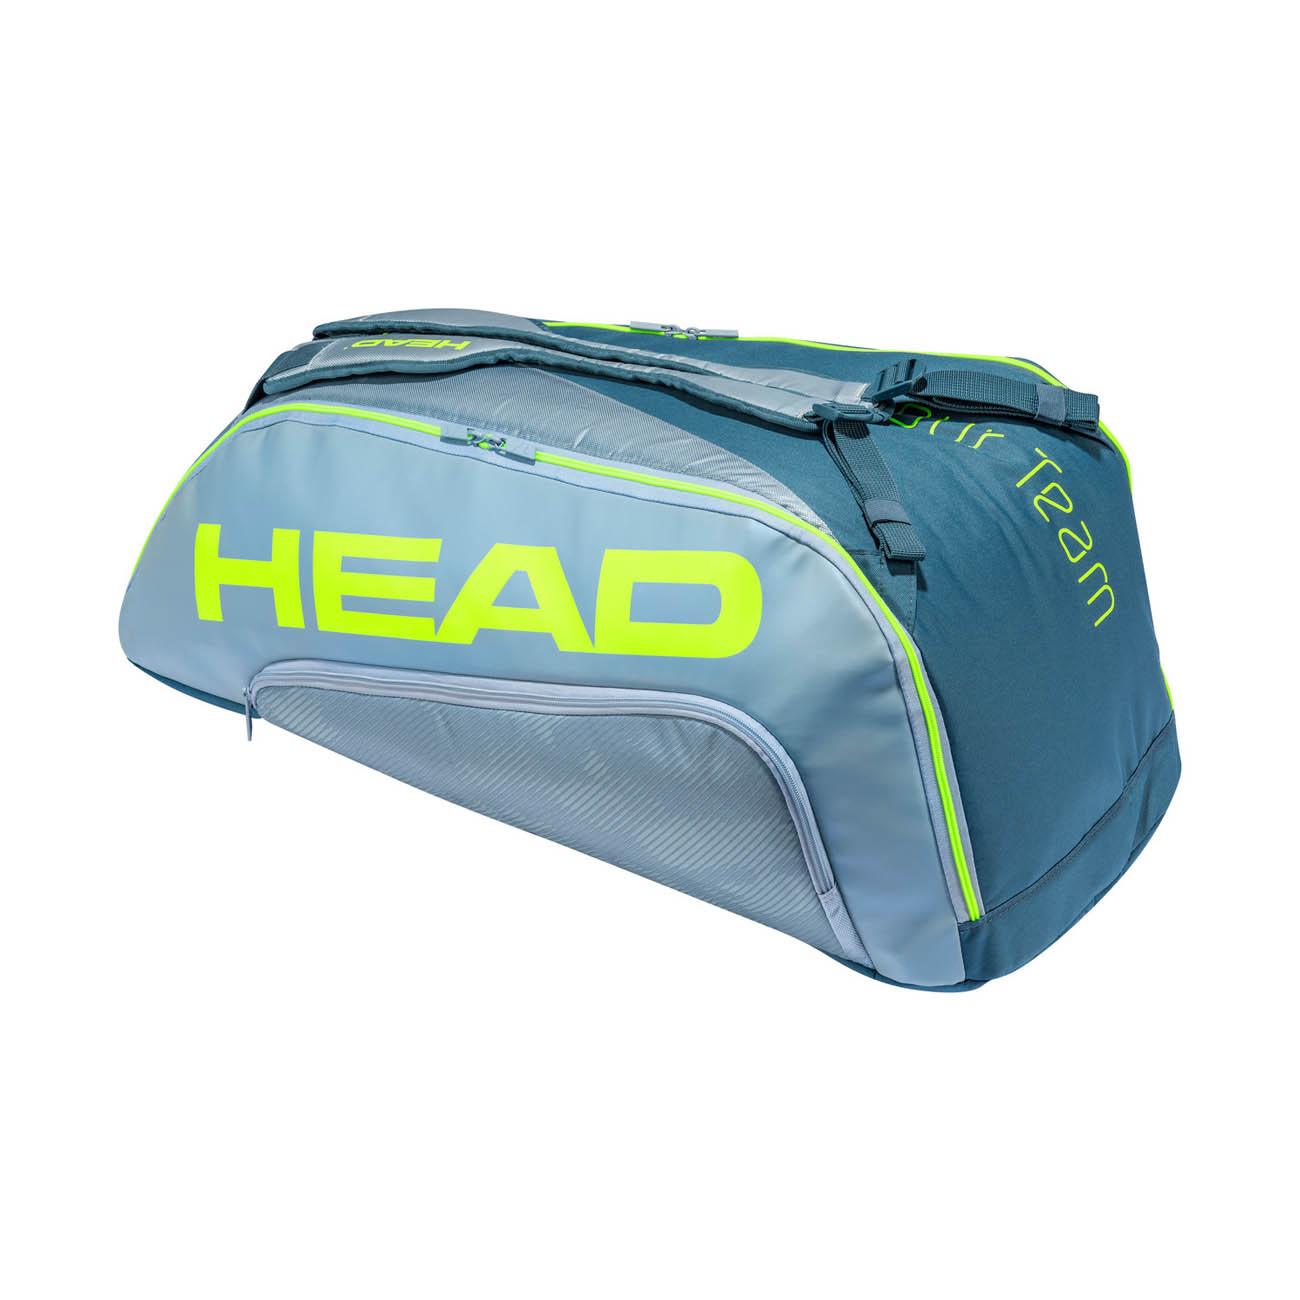 Head Tour Team Extreme Supercombi x 9 Bag - Grey/Neon Yellow